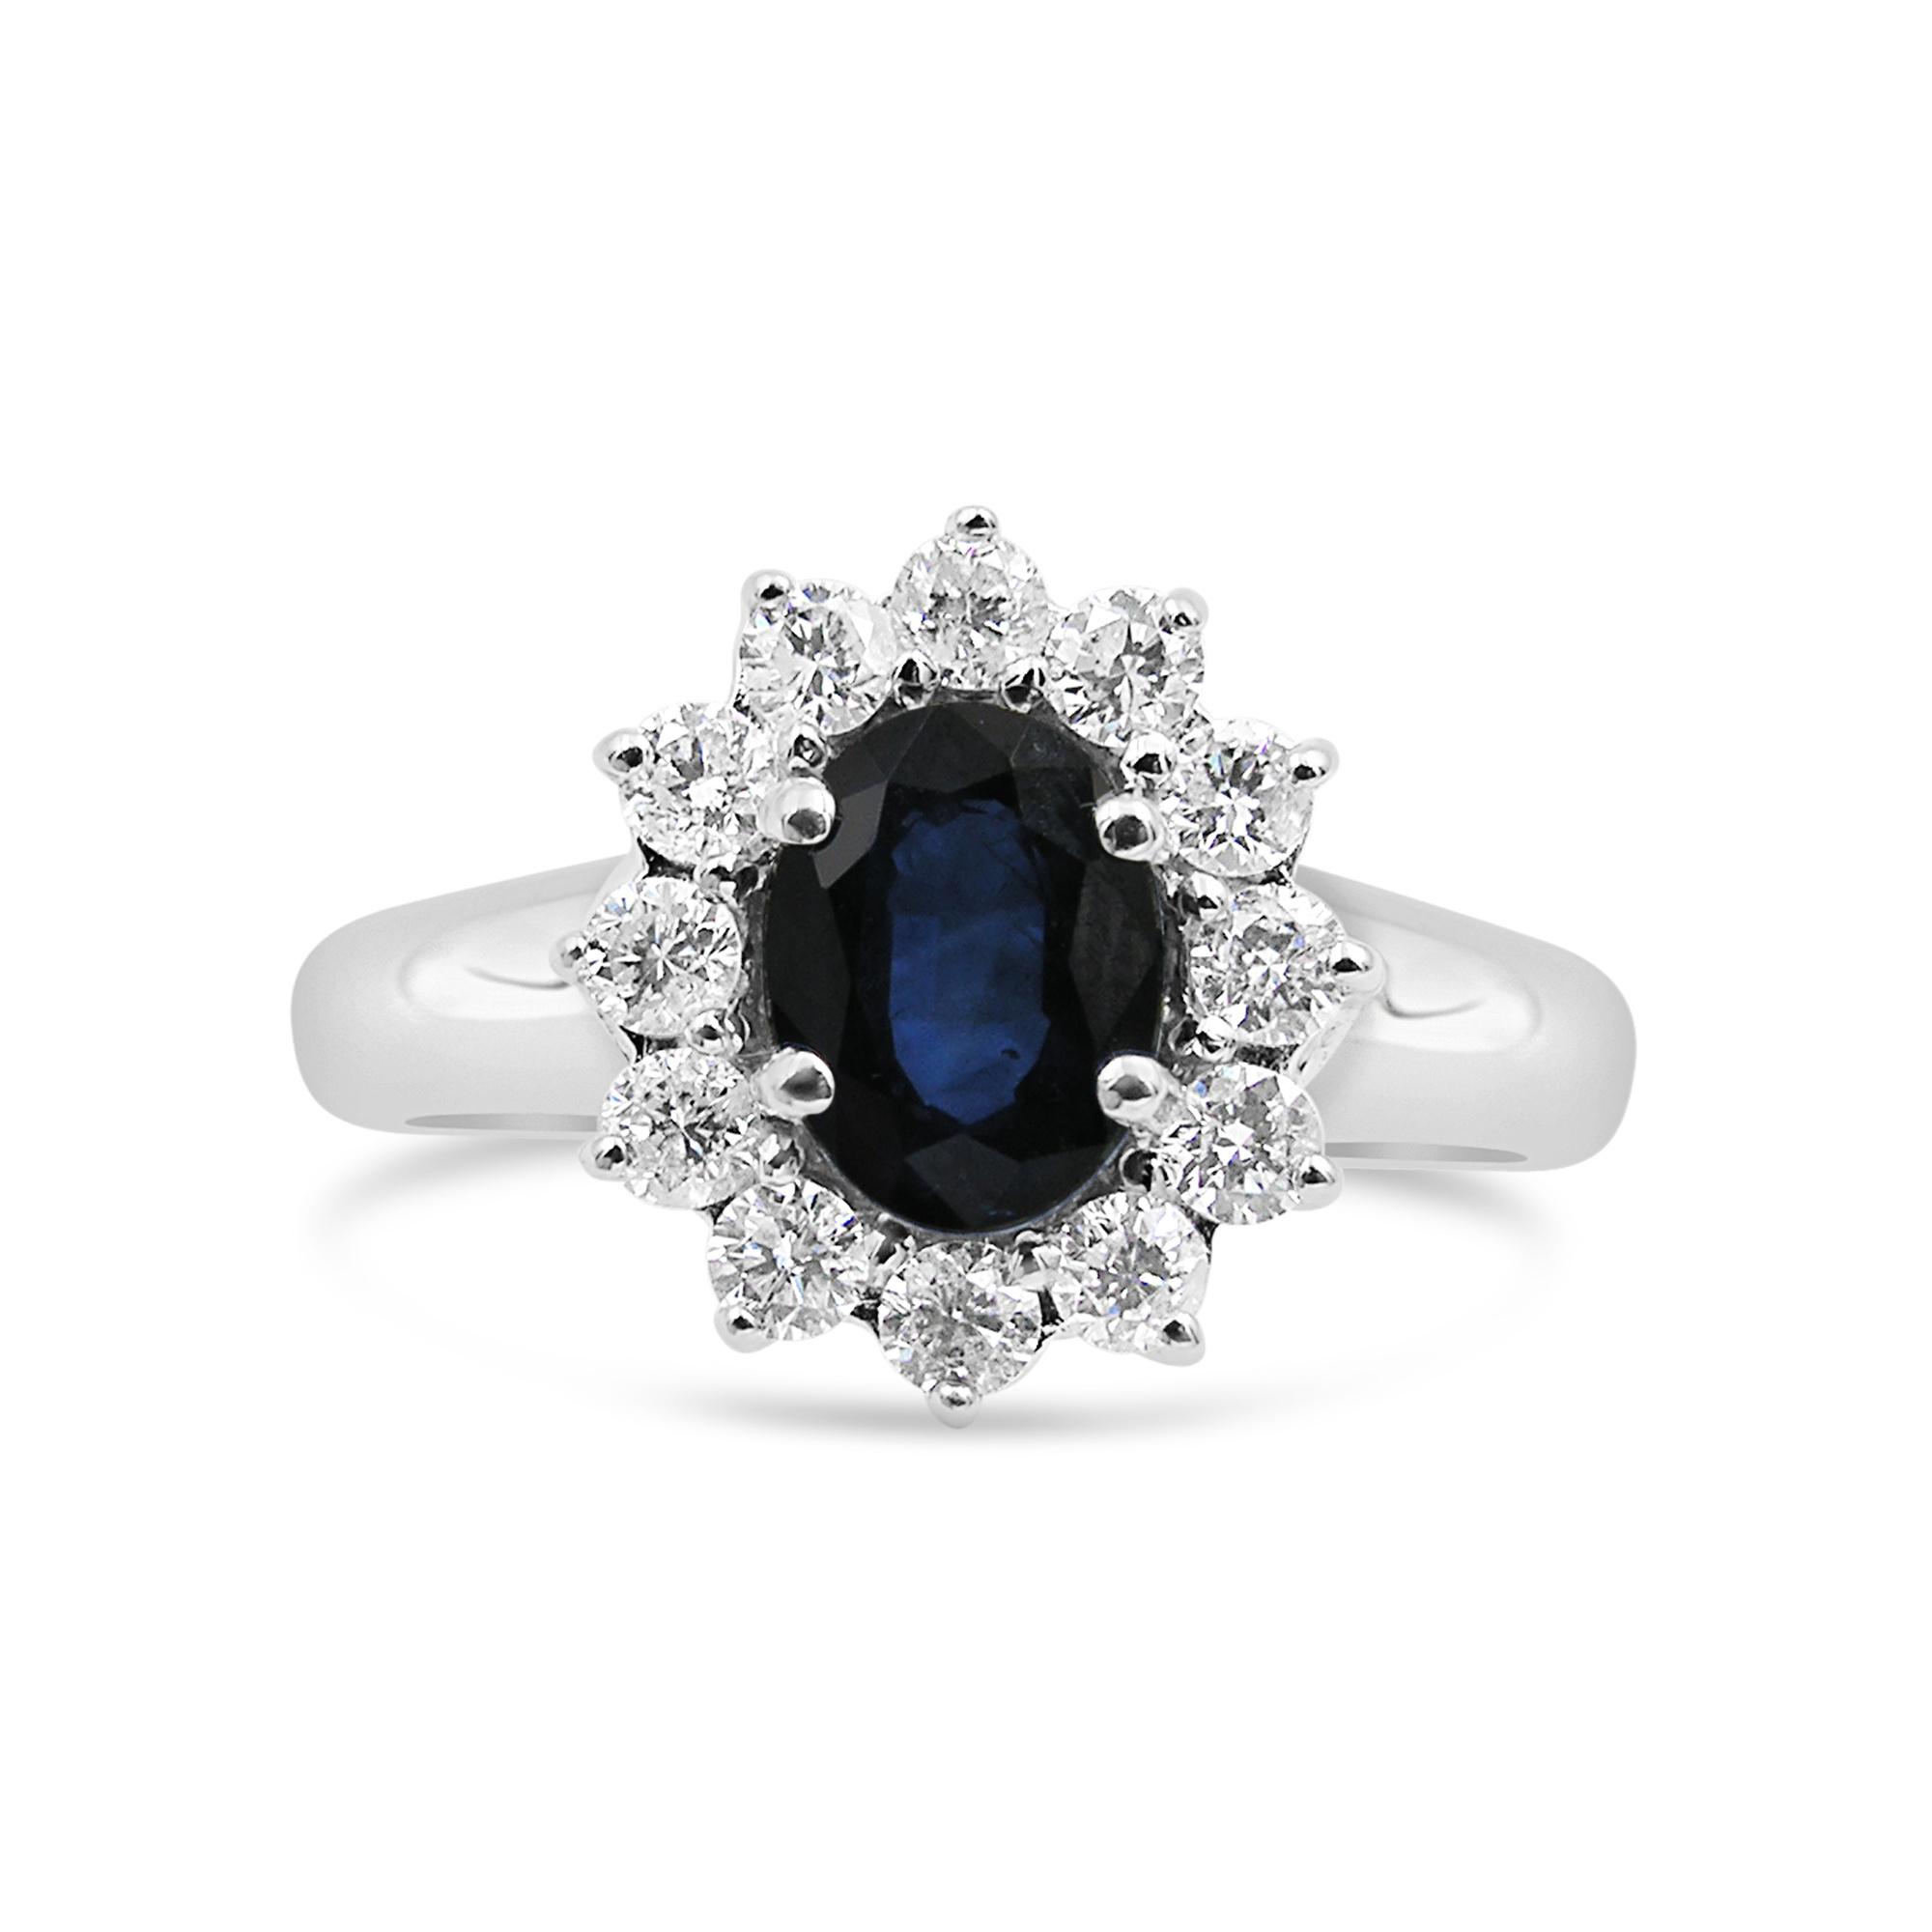 18 karat white gold ring with 0.60 ct diamonds  & 1.10 ct sapphire